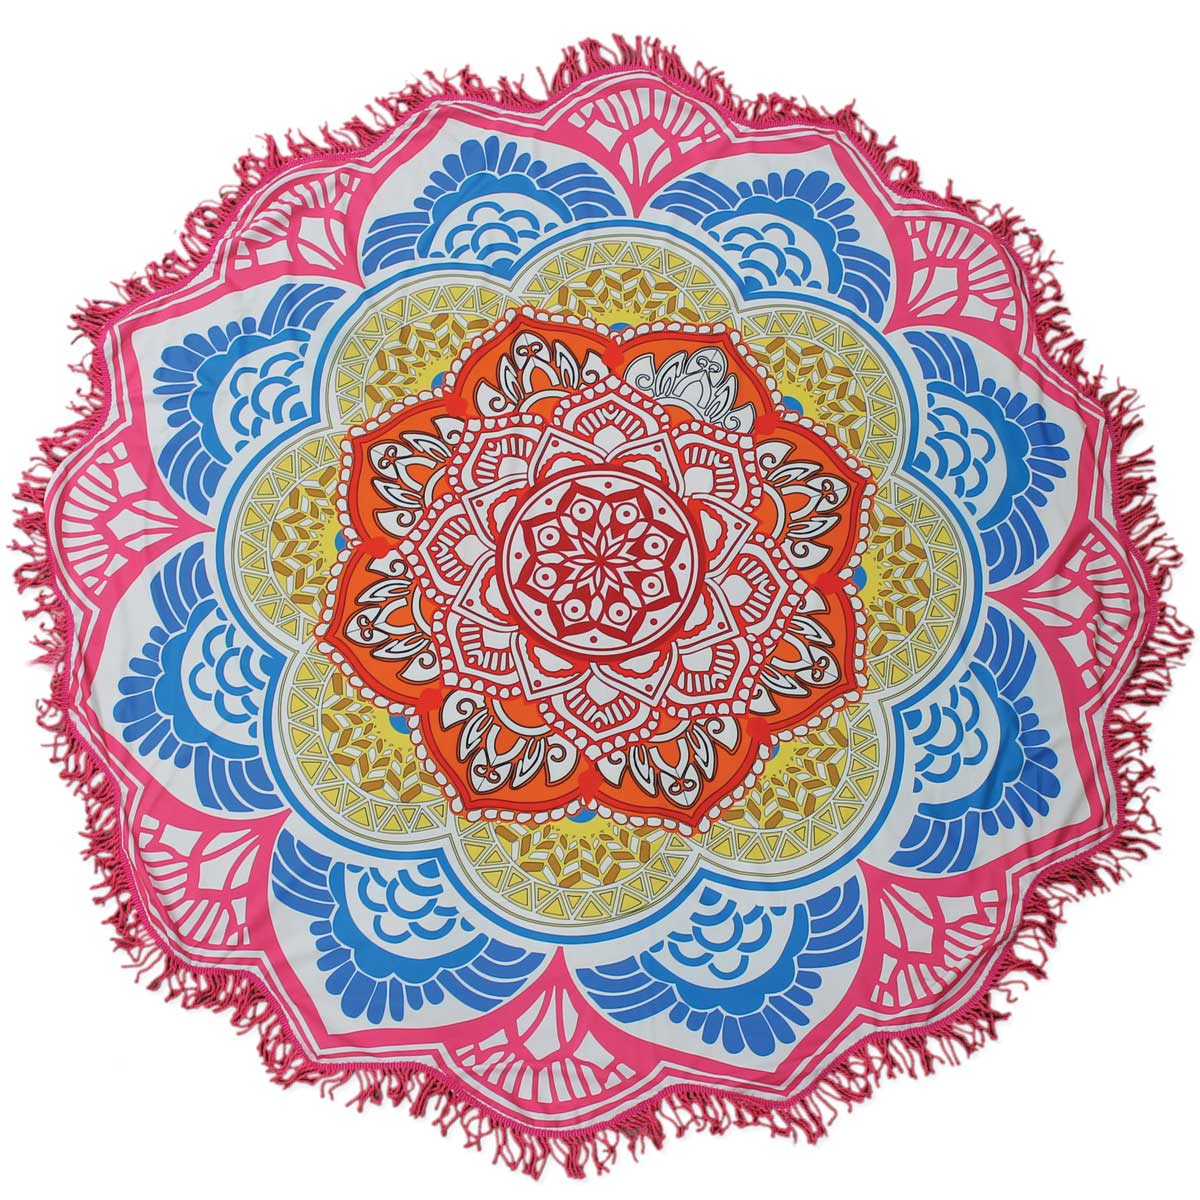 Pink Fringe Rounded Flower Blanket